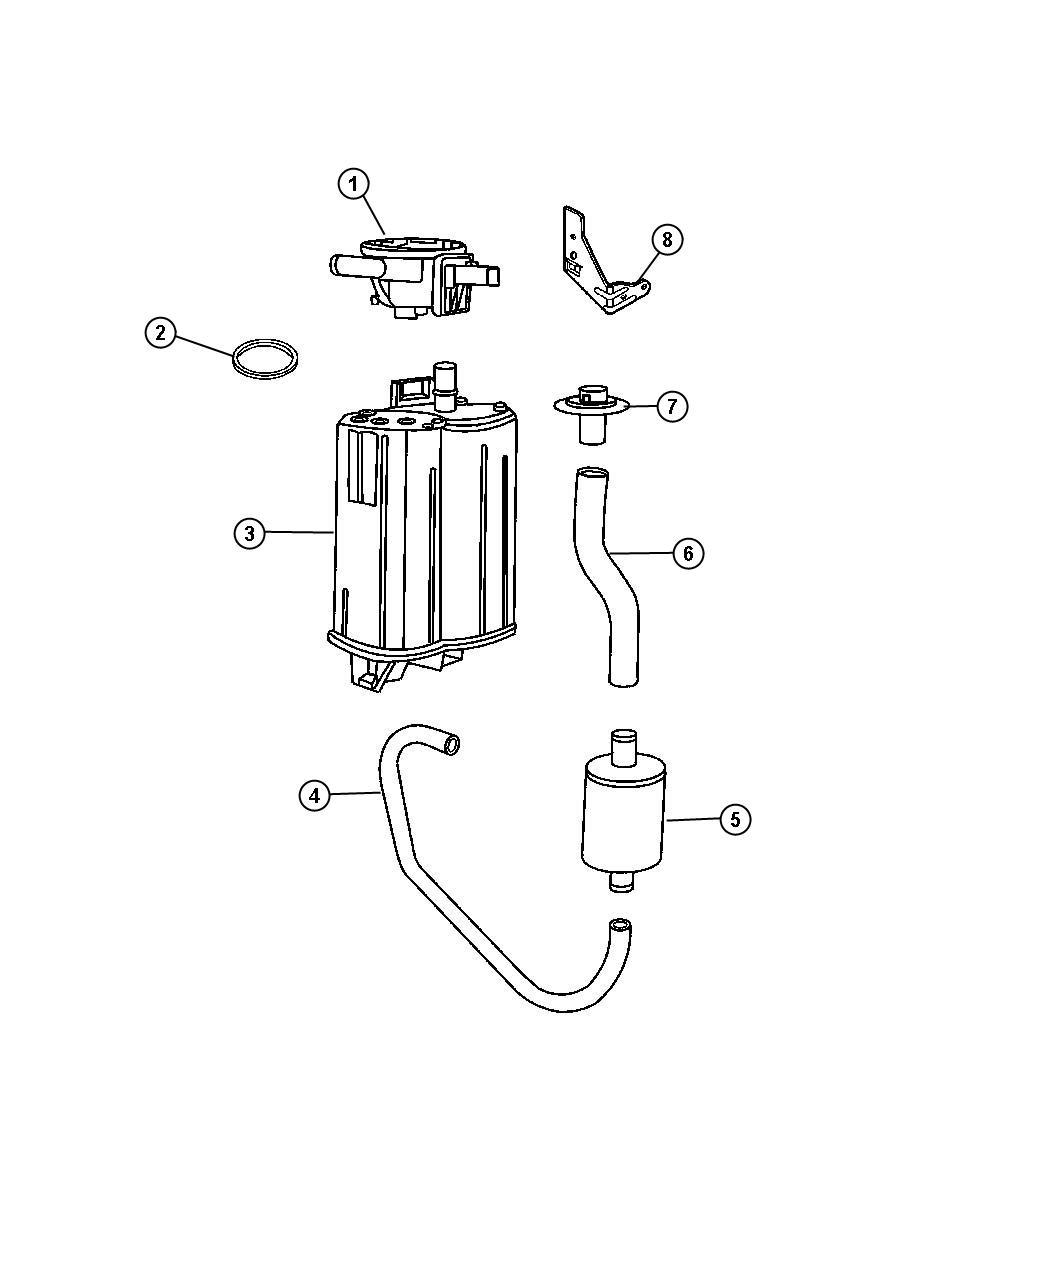 Dodge Durango Vacuum Canister And Leak Detection Pump